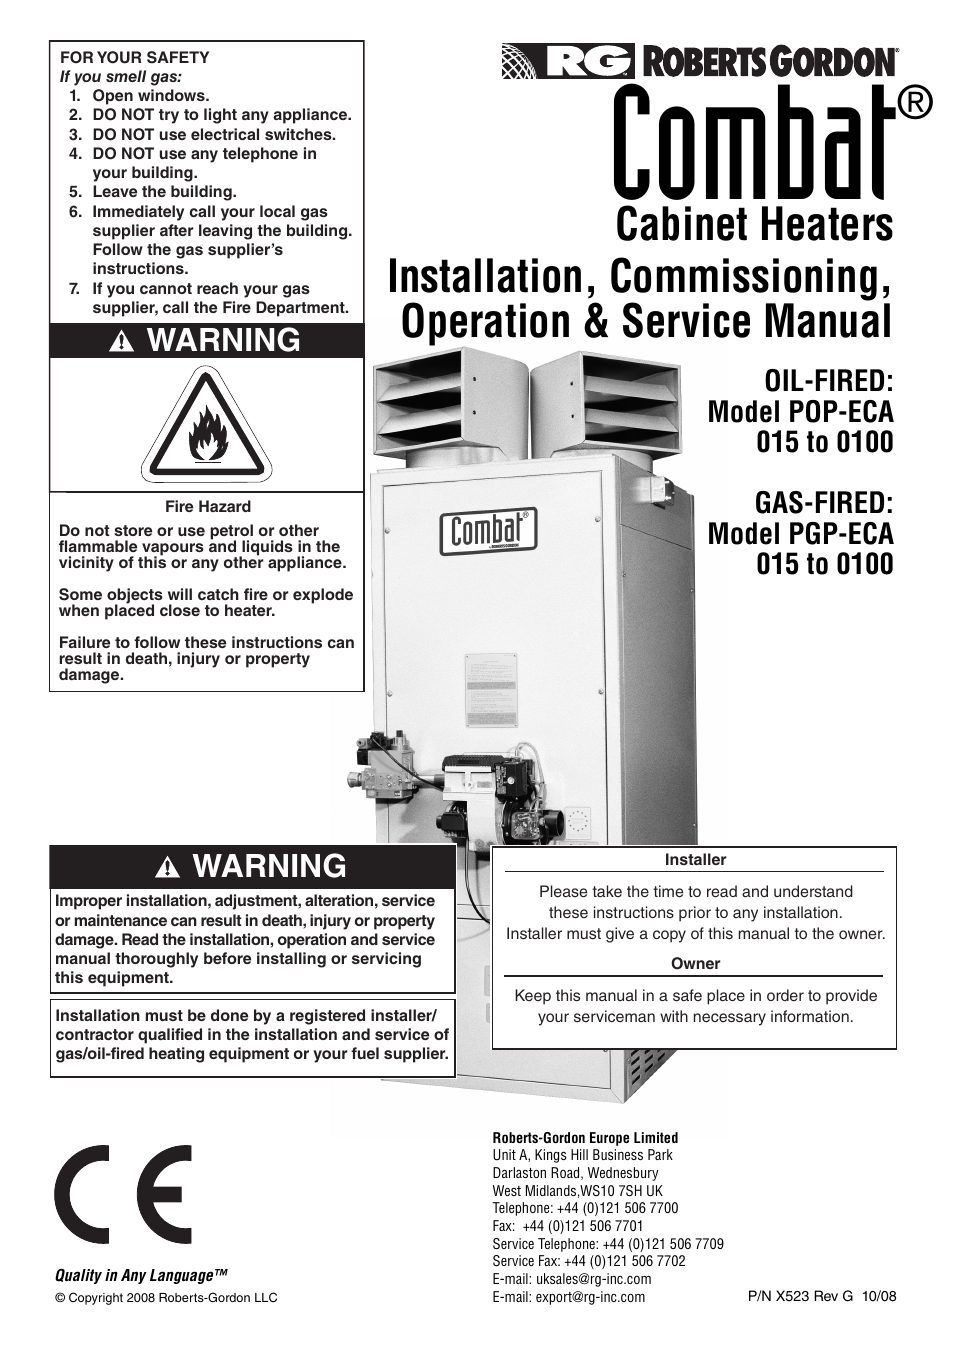 roberts gorden combat cabinet heaters pop eca pgp eca 015 to 0100 rh manualsdir com sun storedge 3000 family installation operation and service manual Gutter Installation Guide